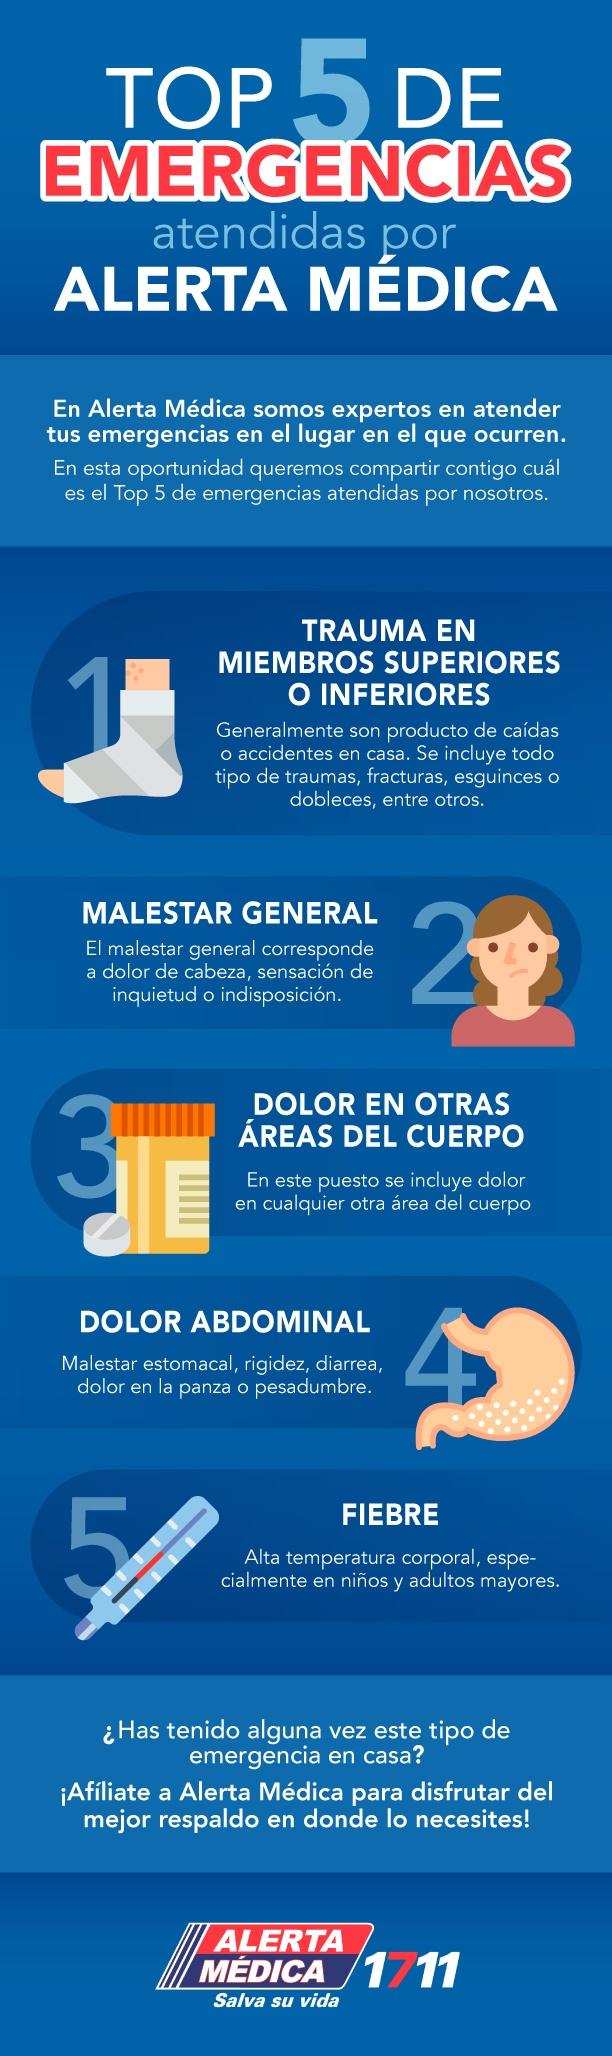 Alerta-Médica-top5emergencias-completa